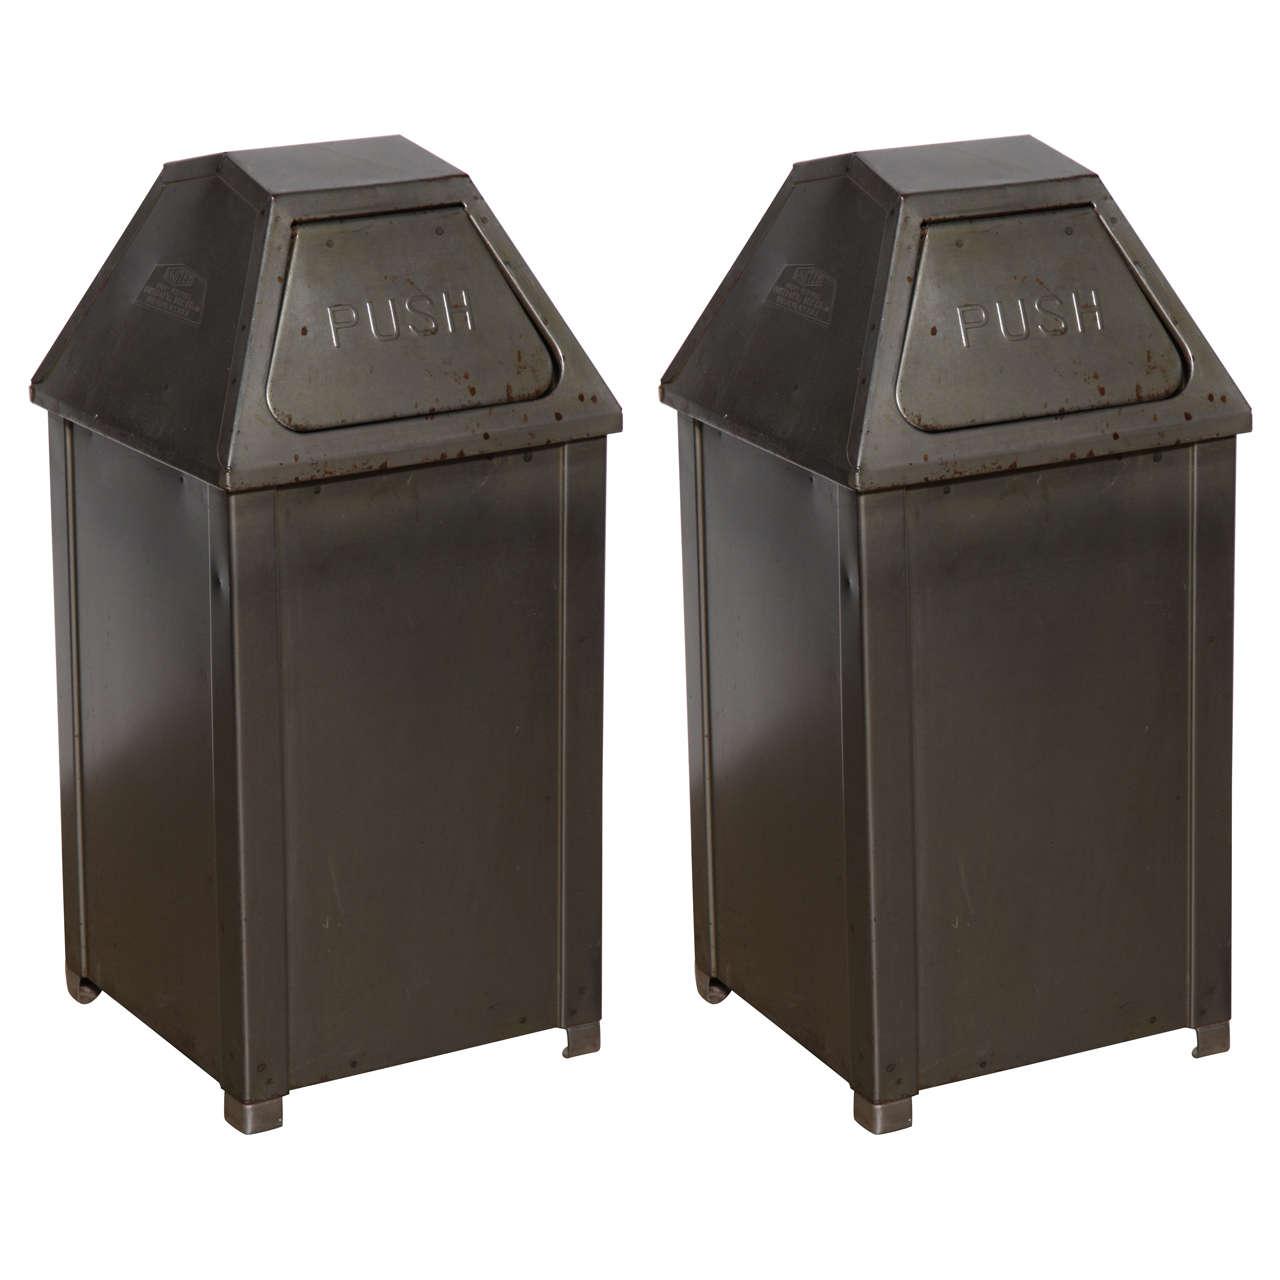 Pair Of Mid Century Mini Push Steel Trash Cans